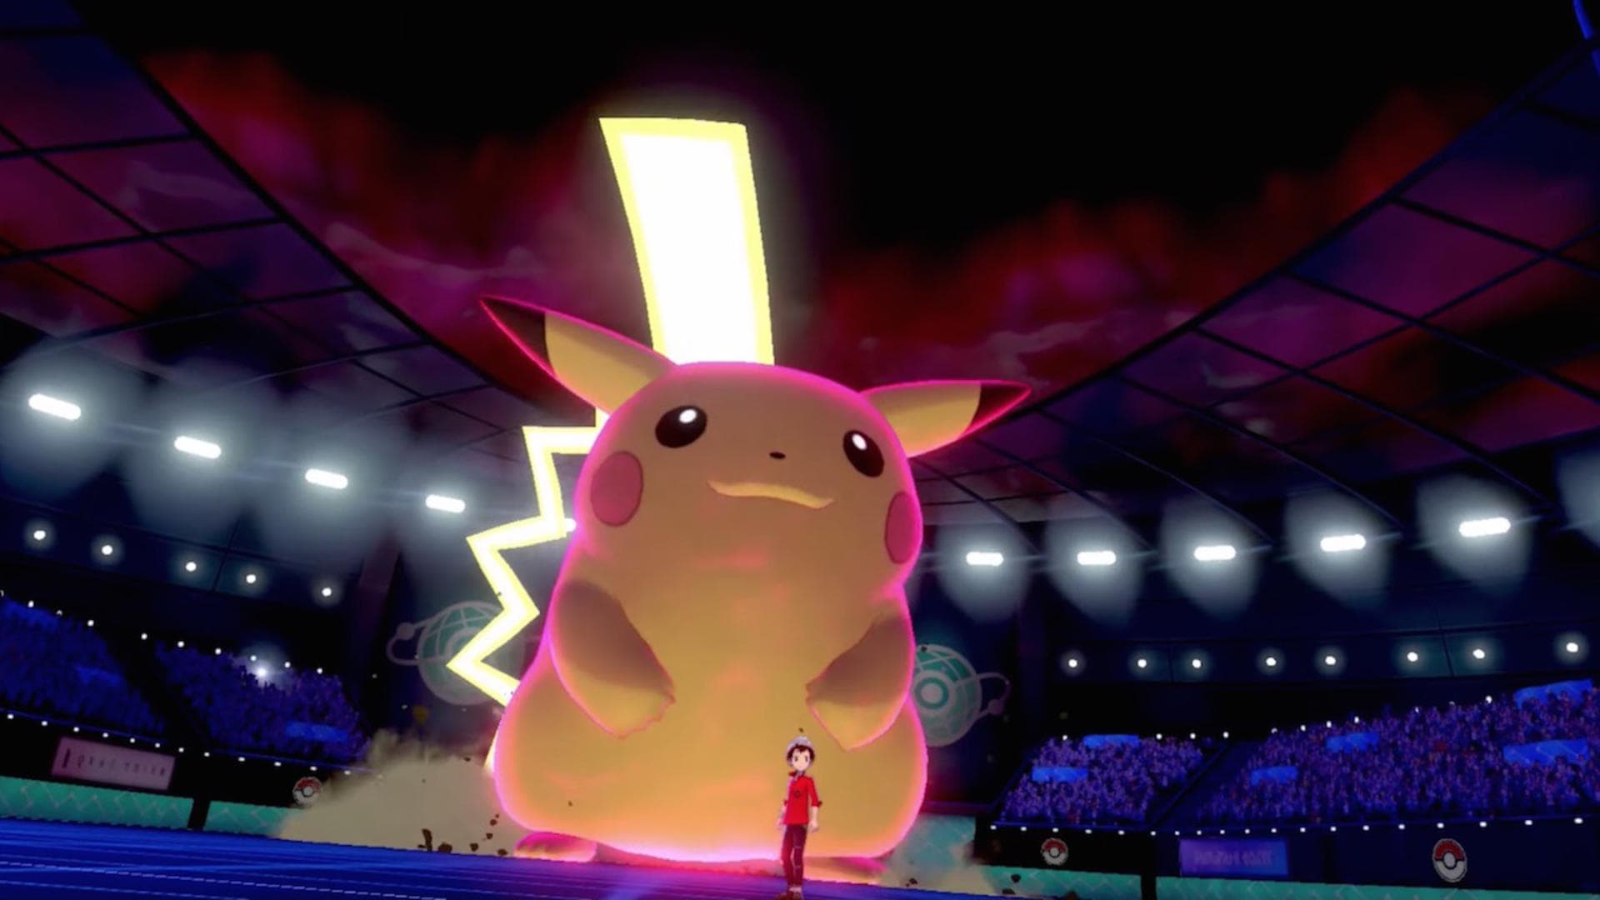 Pokemon Sword And Shield Introduces Bonus Gigantamax Forms